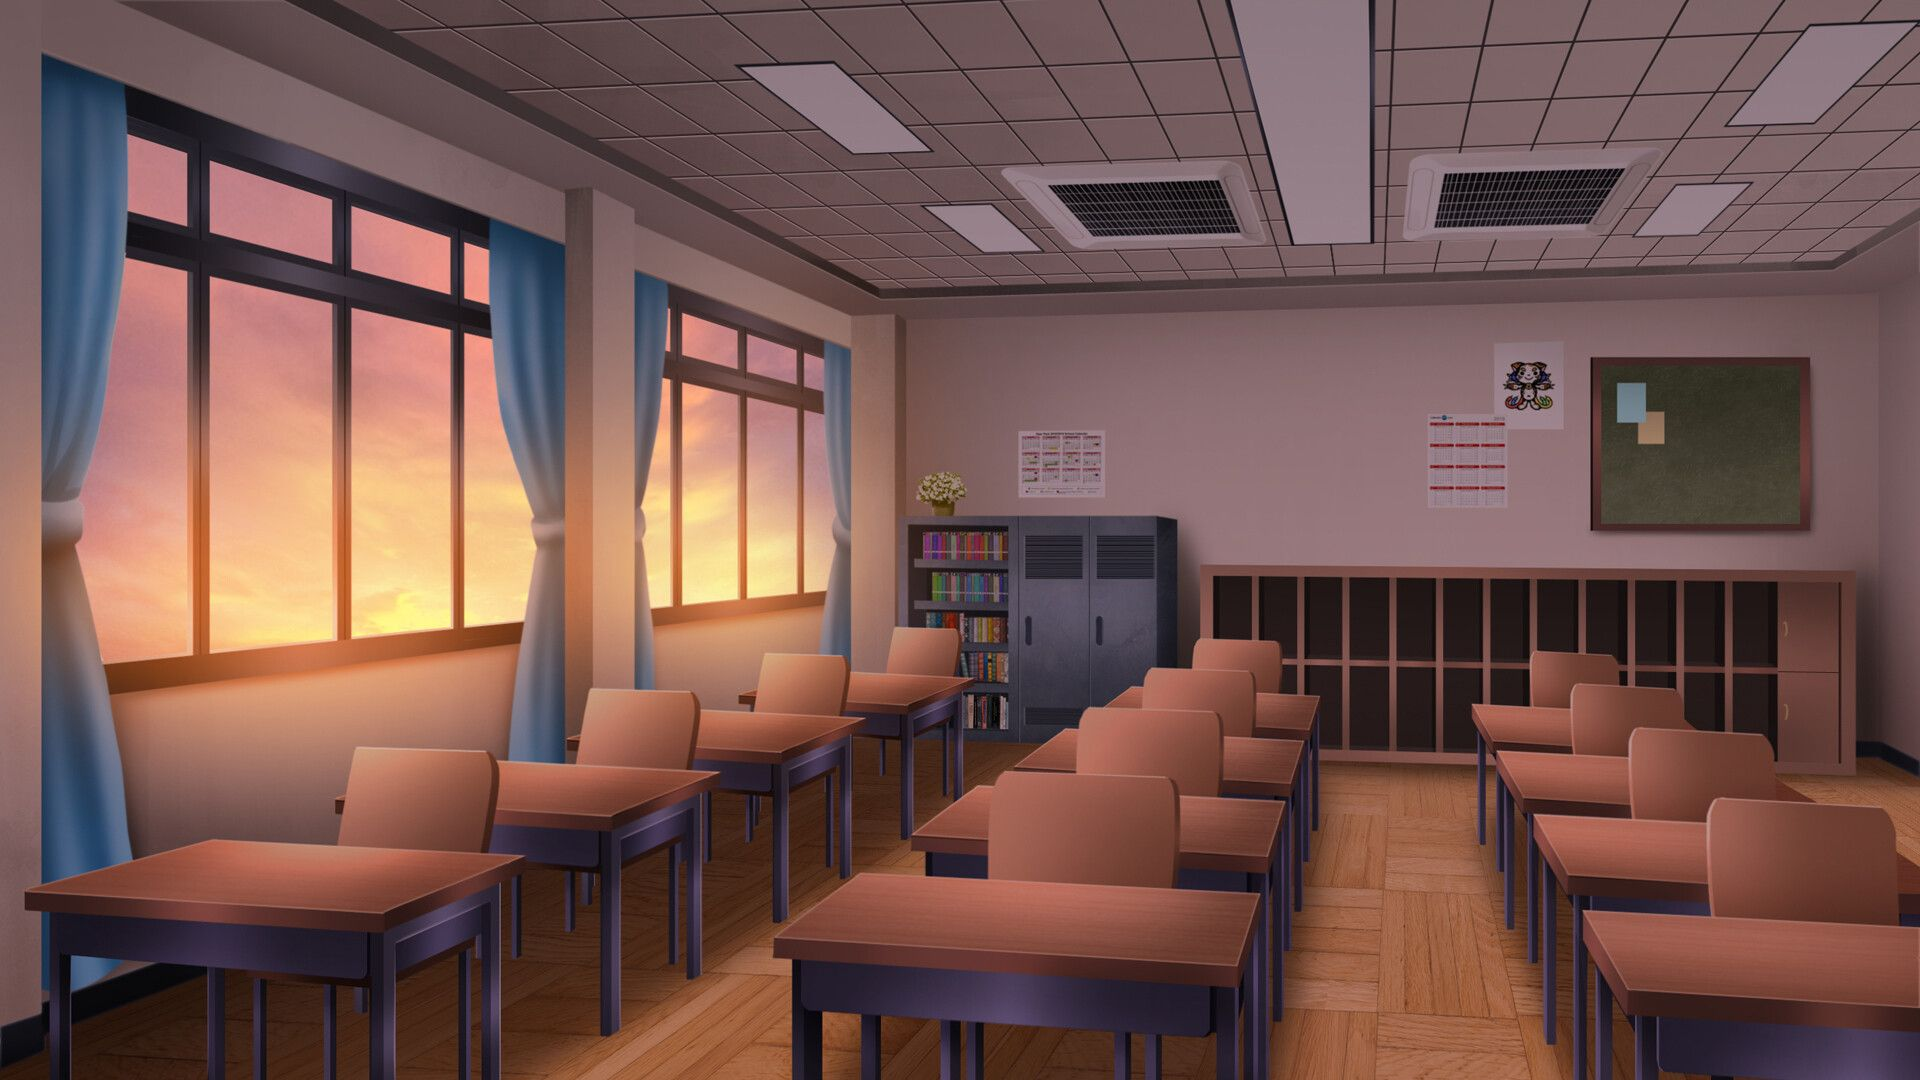 Artstation Classroom Visual Novel Bg Duy Tung Anime Classroom Anime Backgrounds Wallpapers Anime Scenery Wallpaper